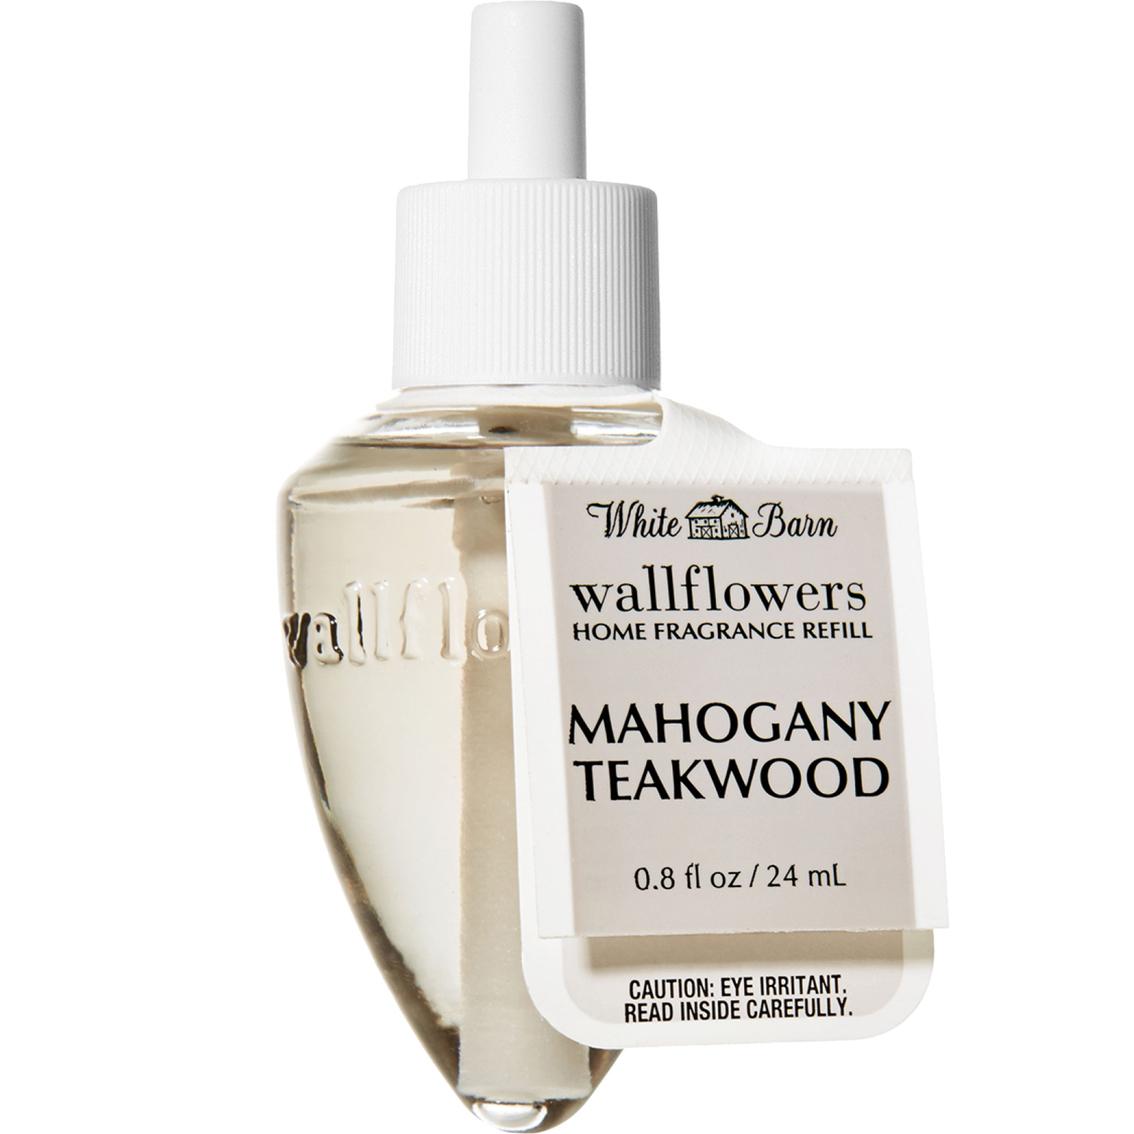 Bath Body Works Mahogany Teakwood Wallflower Refill